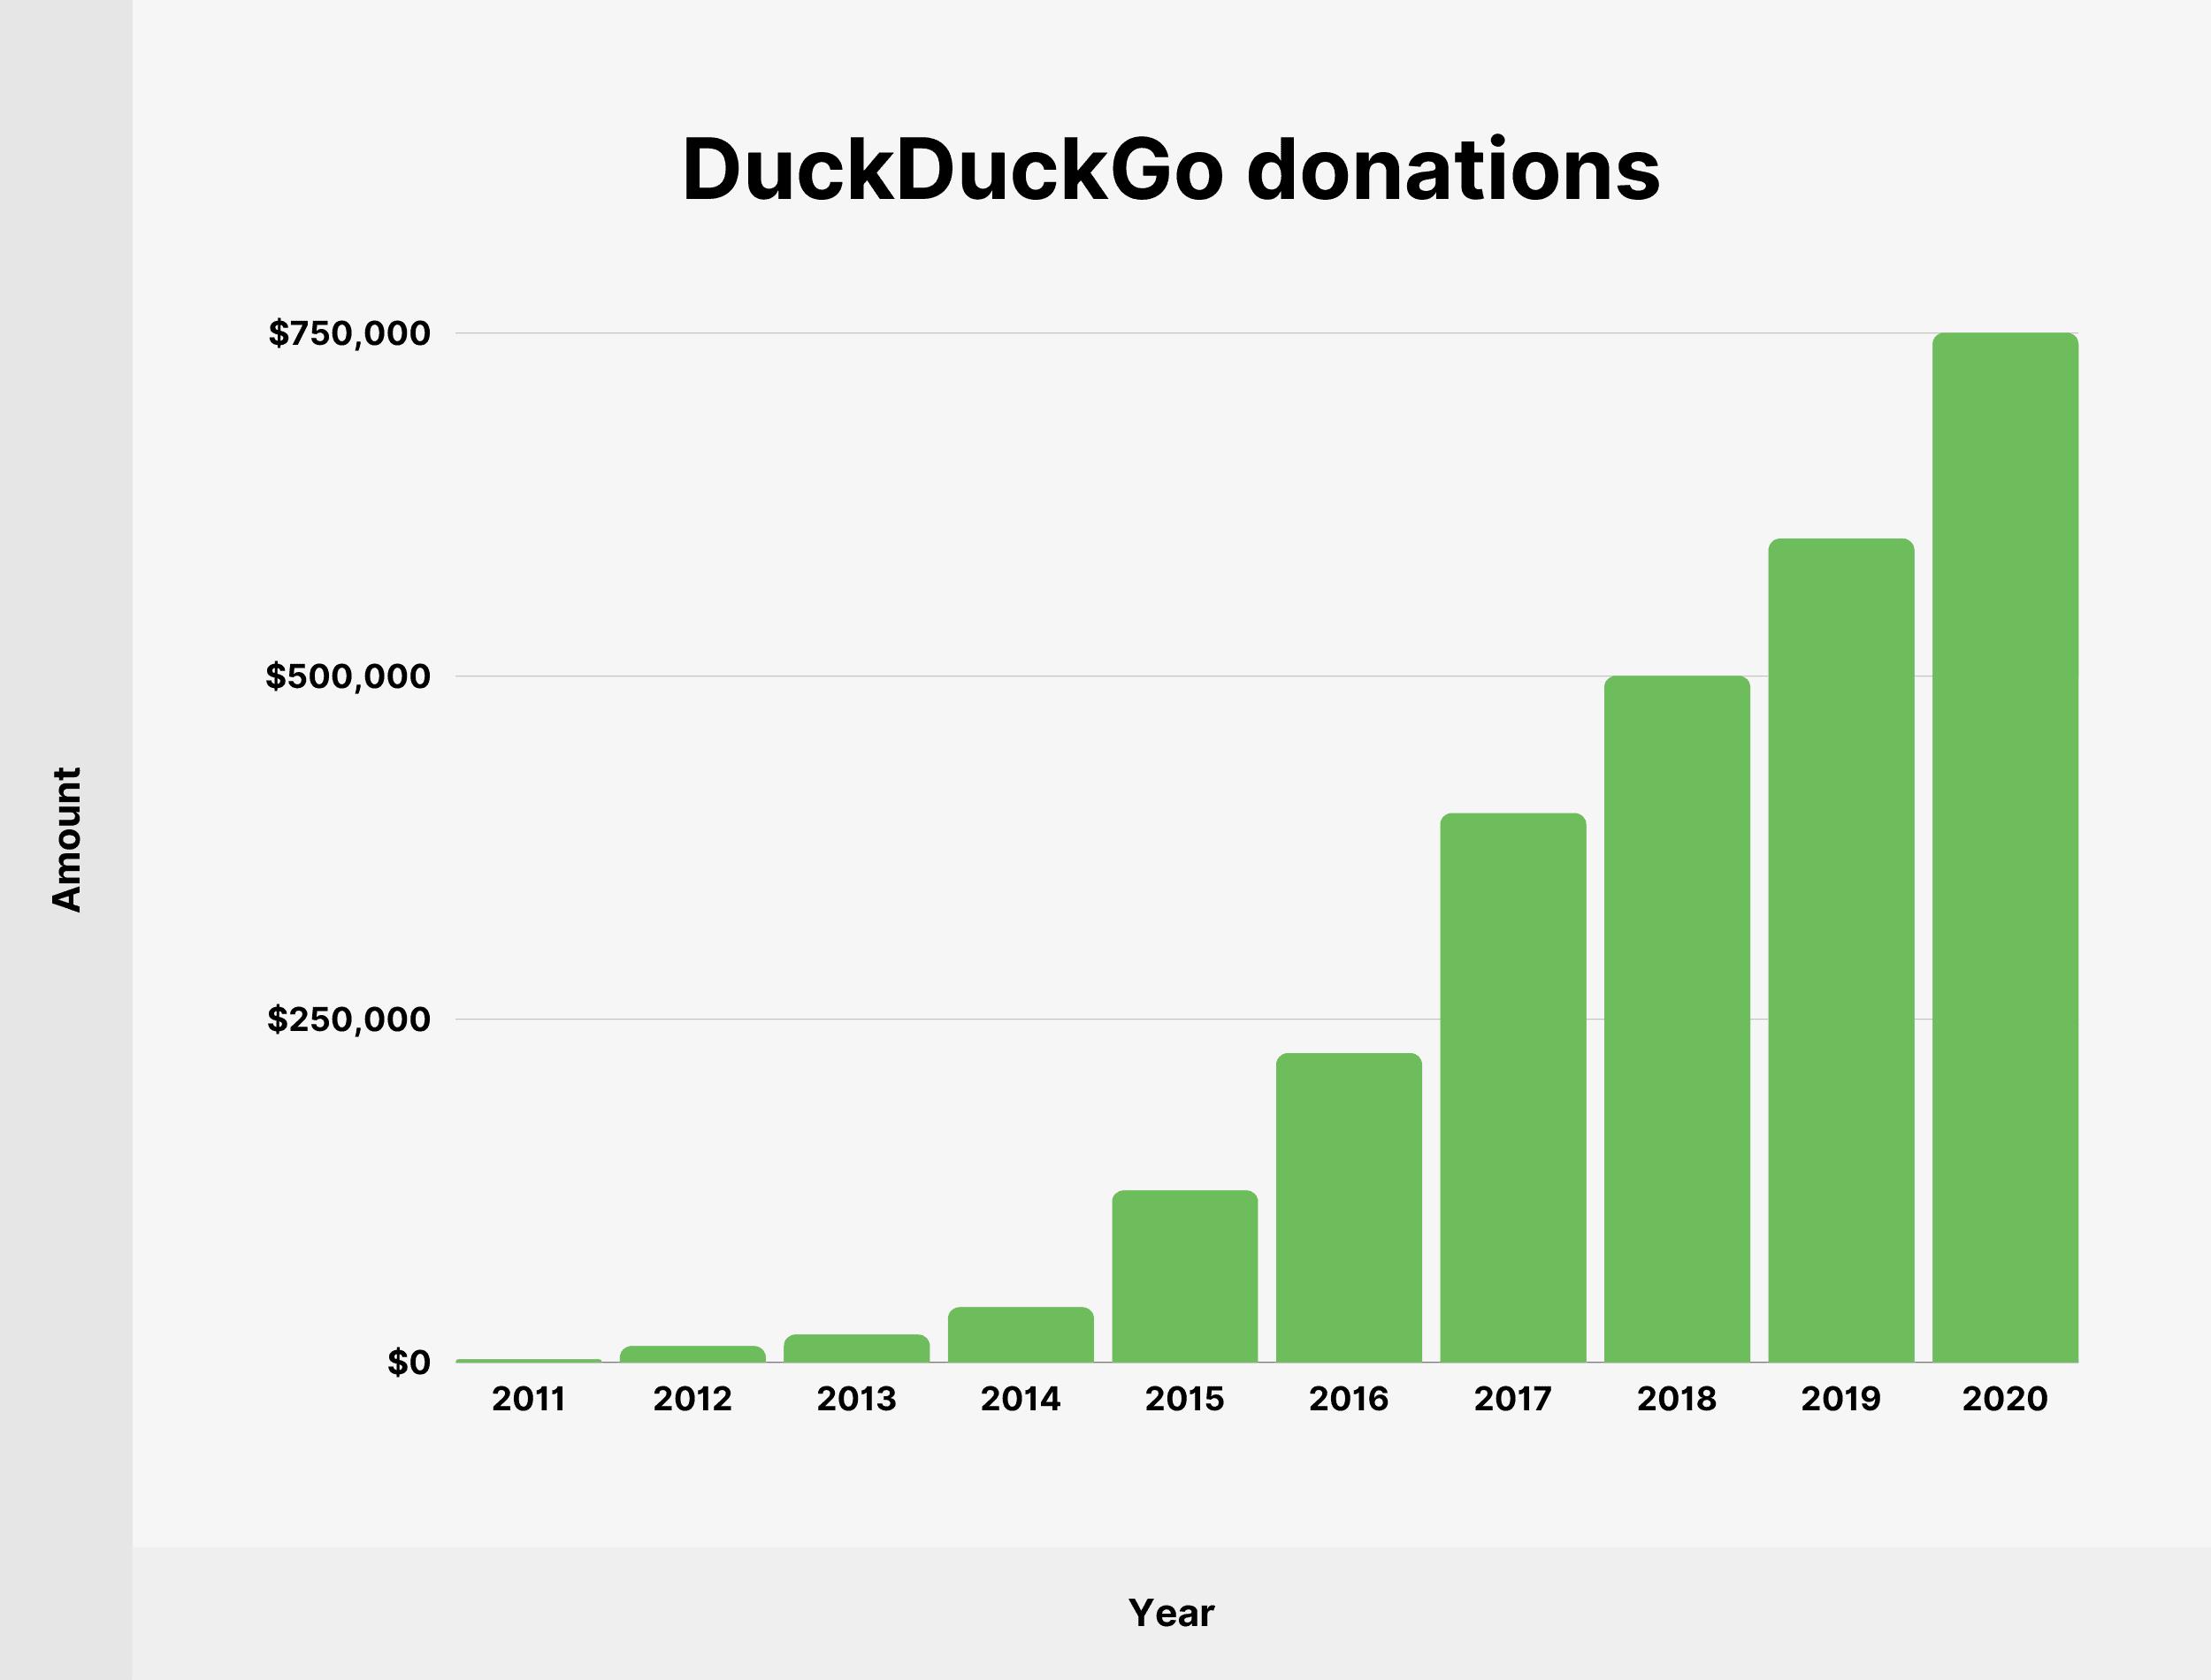 DuckDuckGo donations